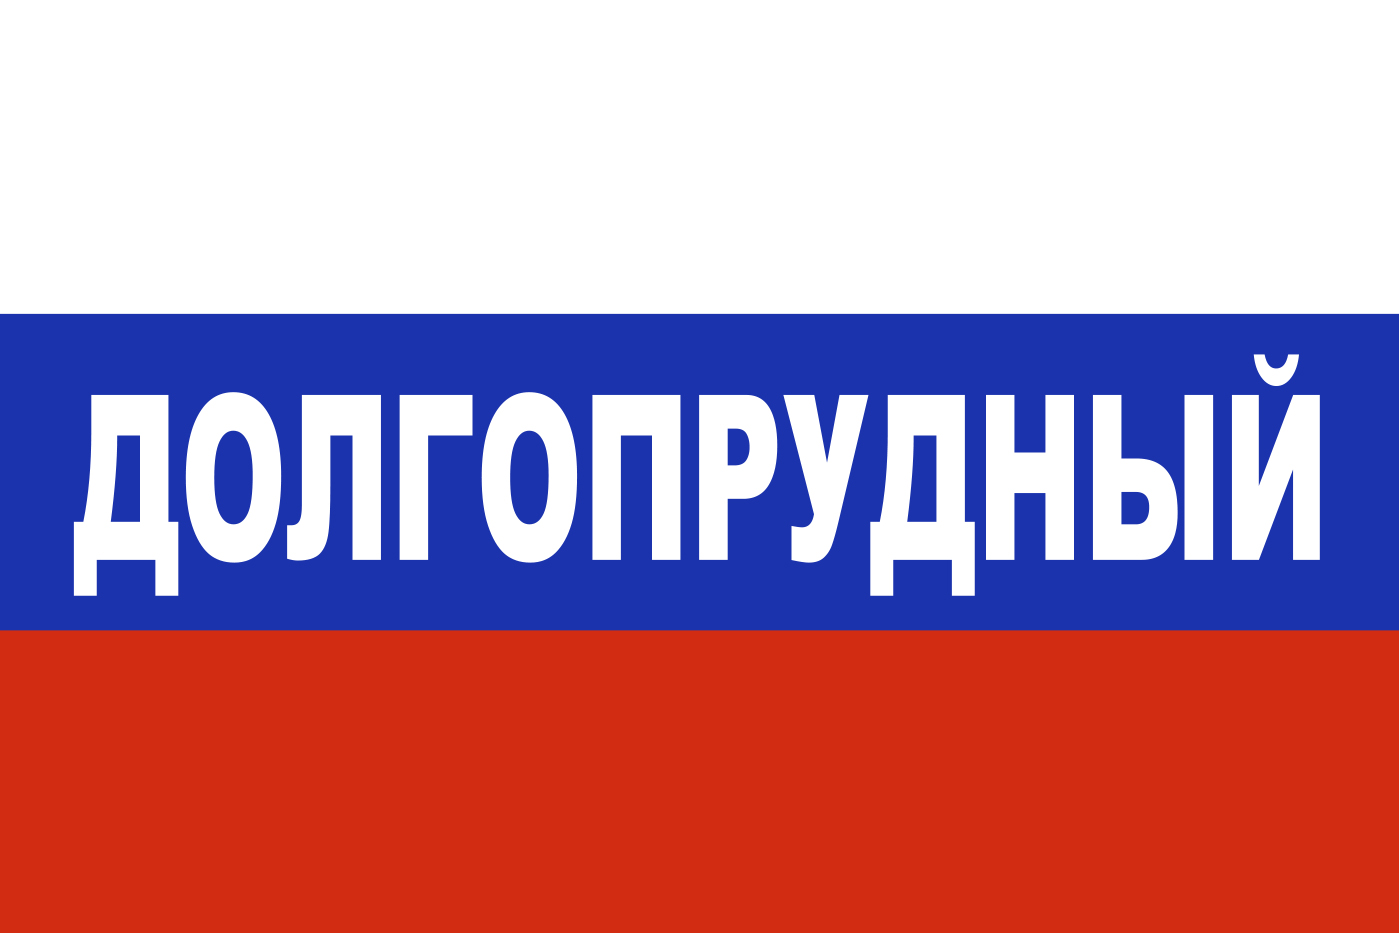 Флаг триколор Долгопрудный